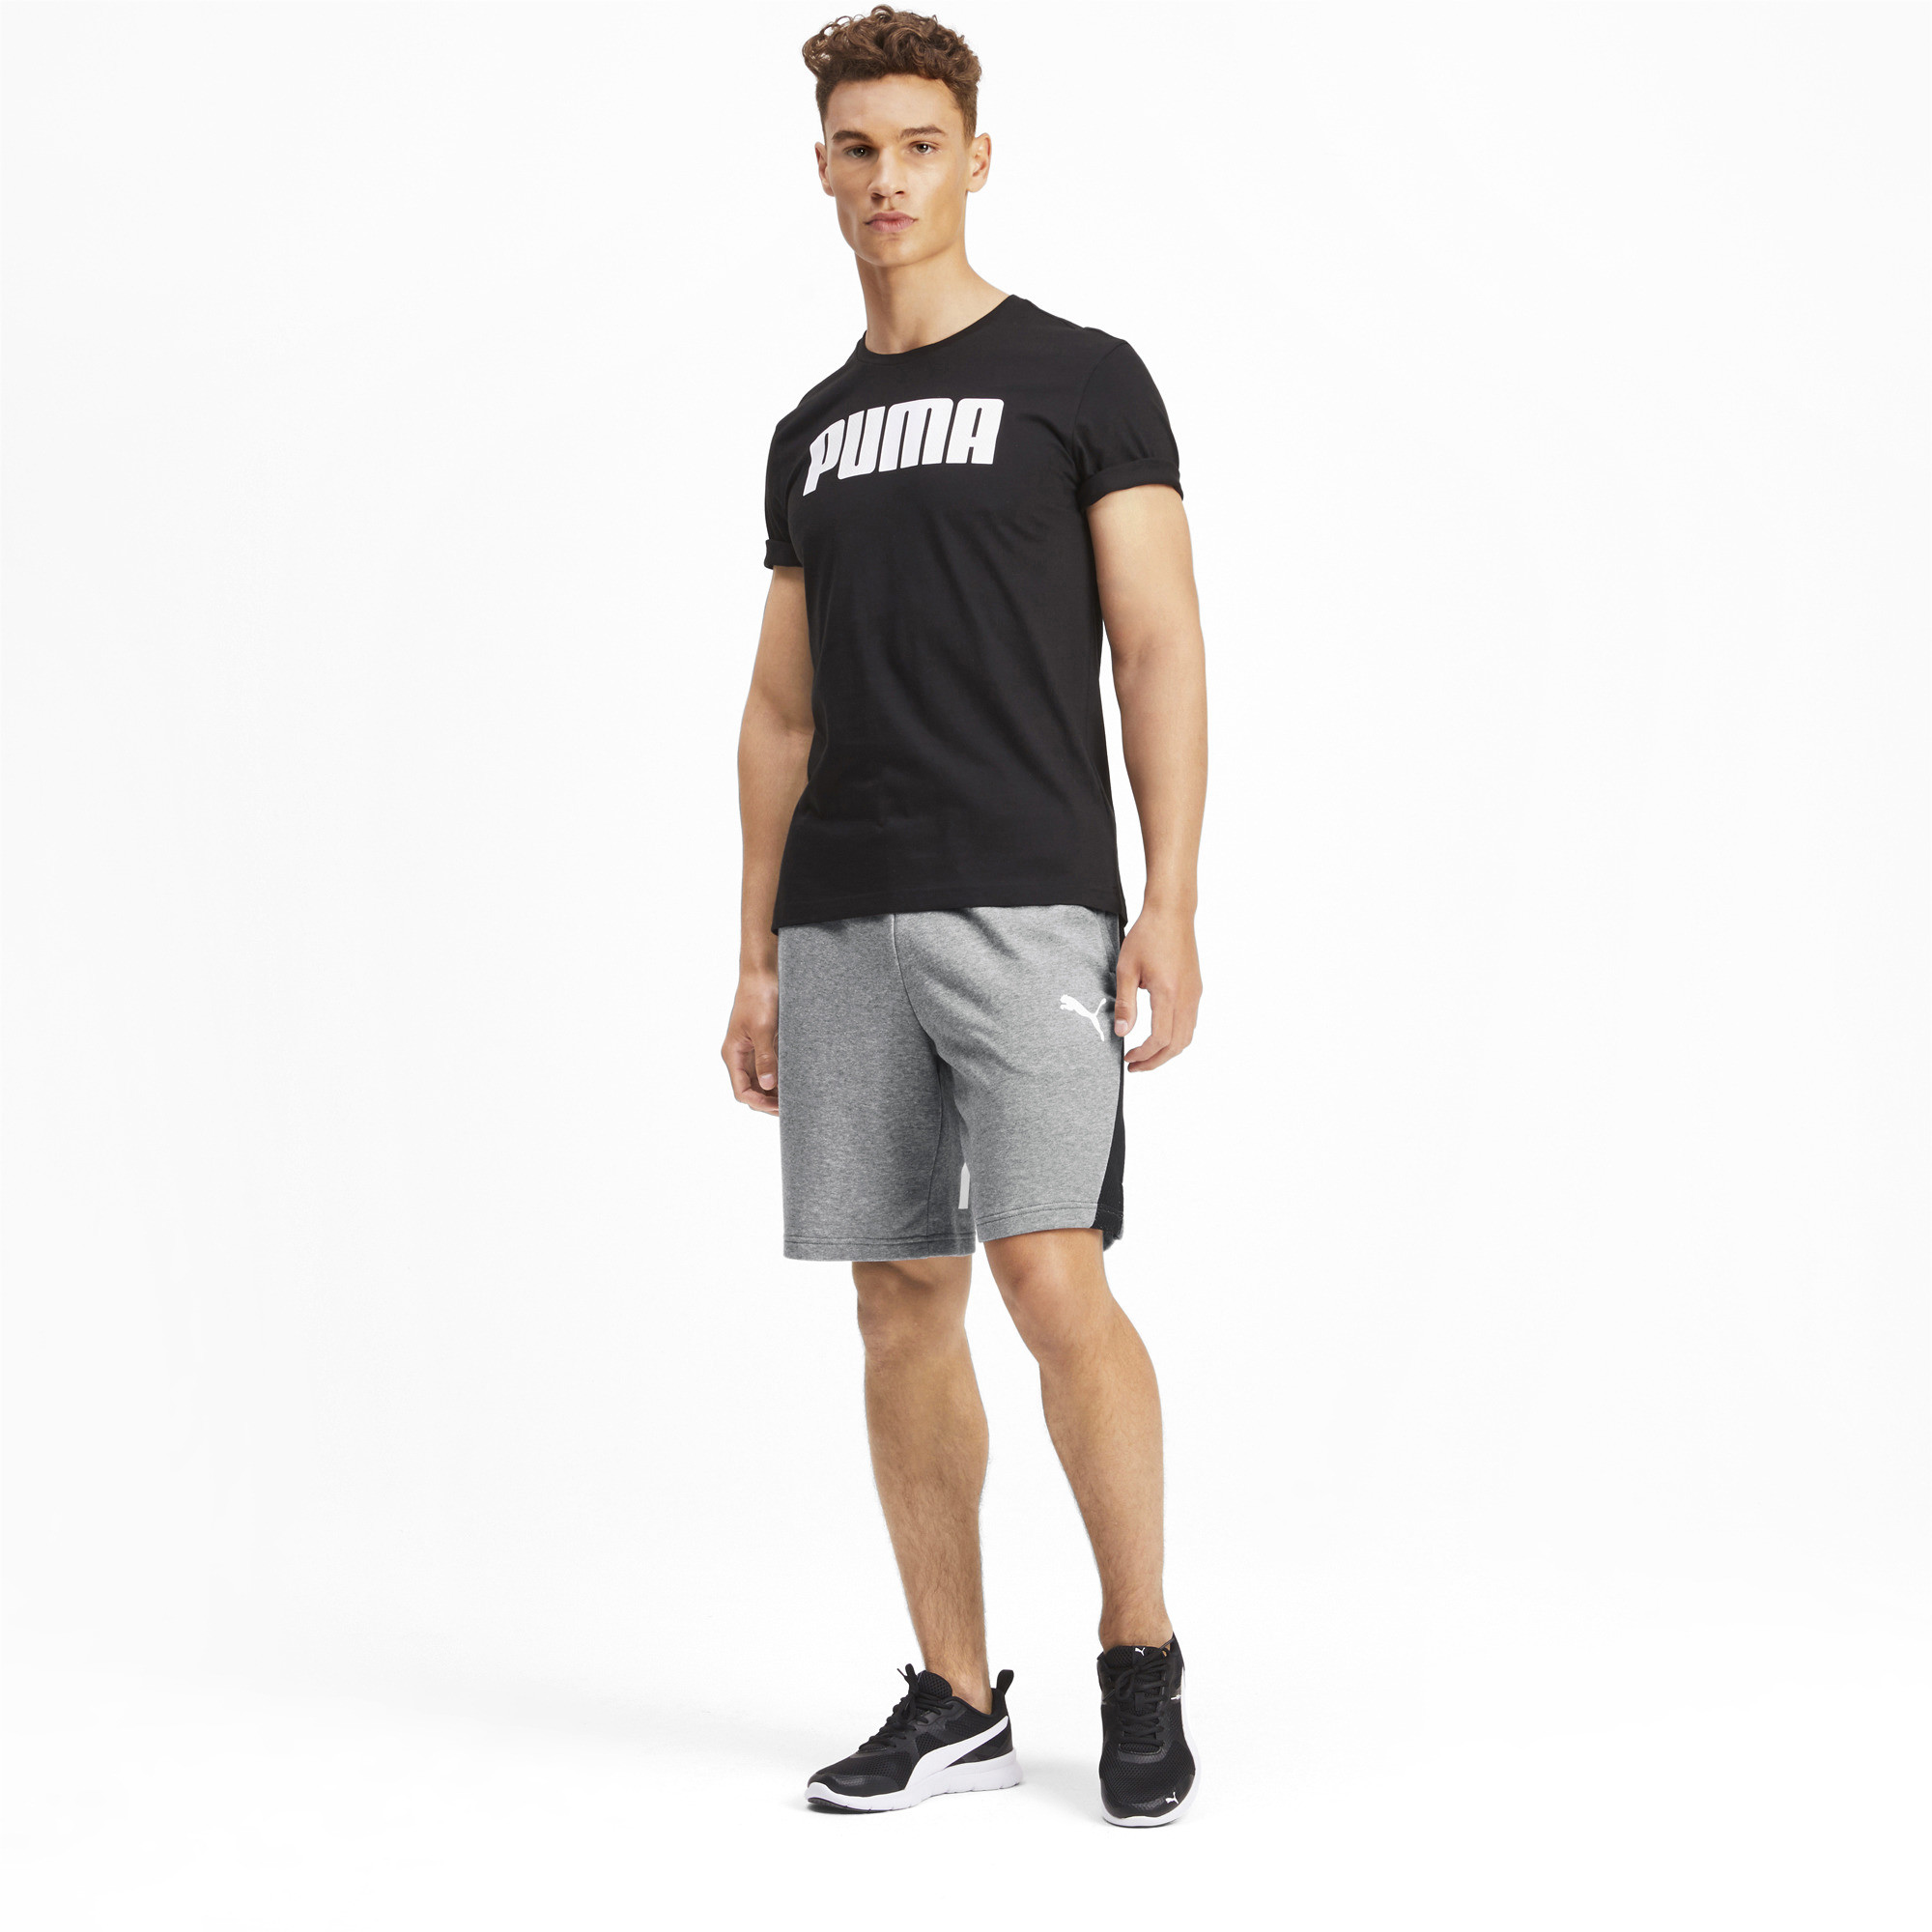 PUMA-Modern-Sports-Men-039-s-Shorts-Men-Knitted-Shorts-Basics thumbnail 11